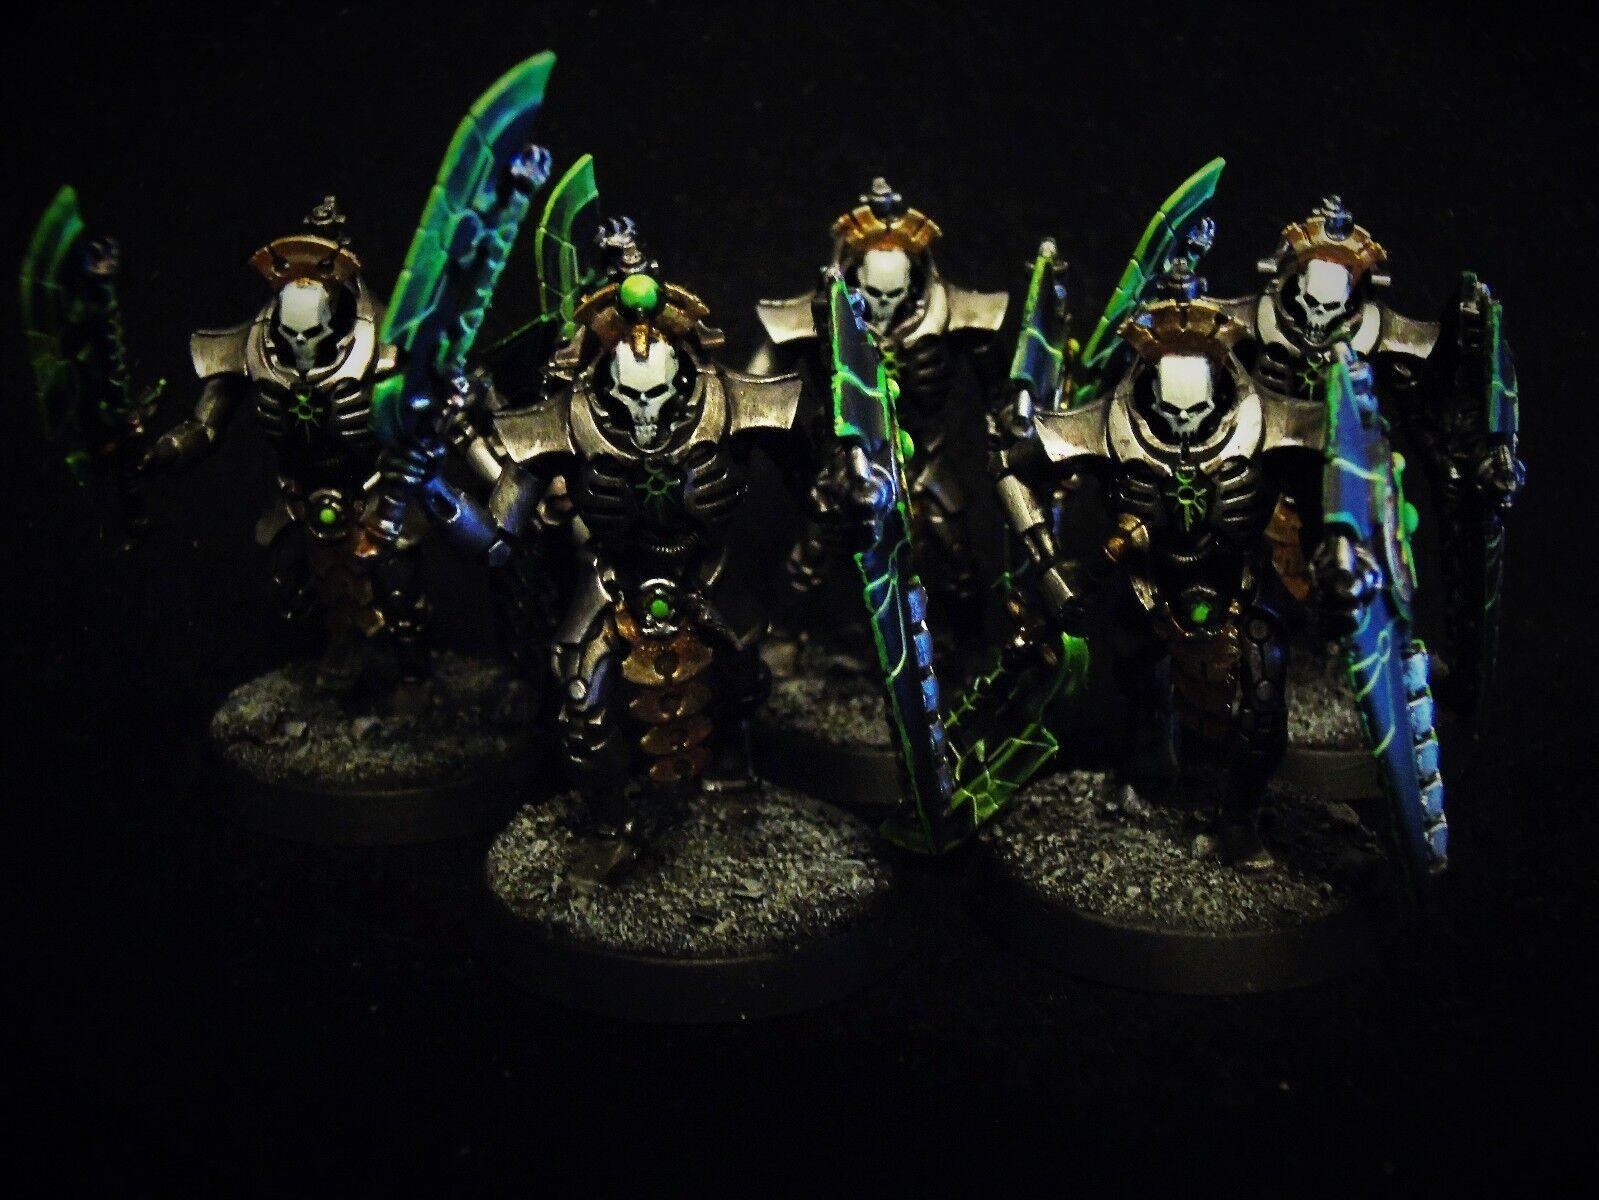 Warhammer 40,000 Necron lychguard Pro Pintado